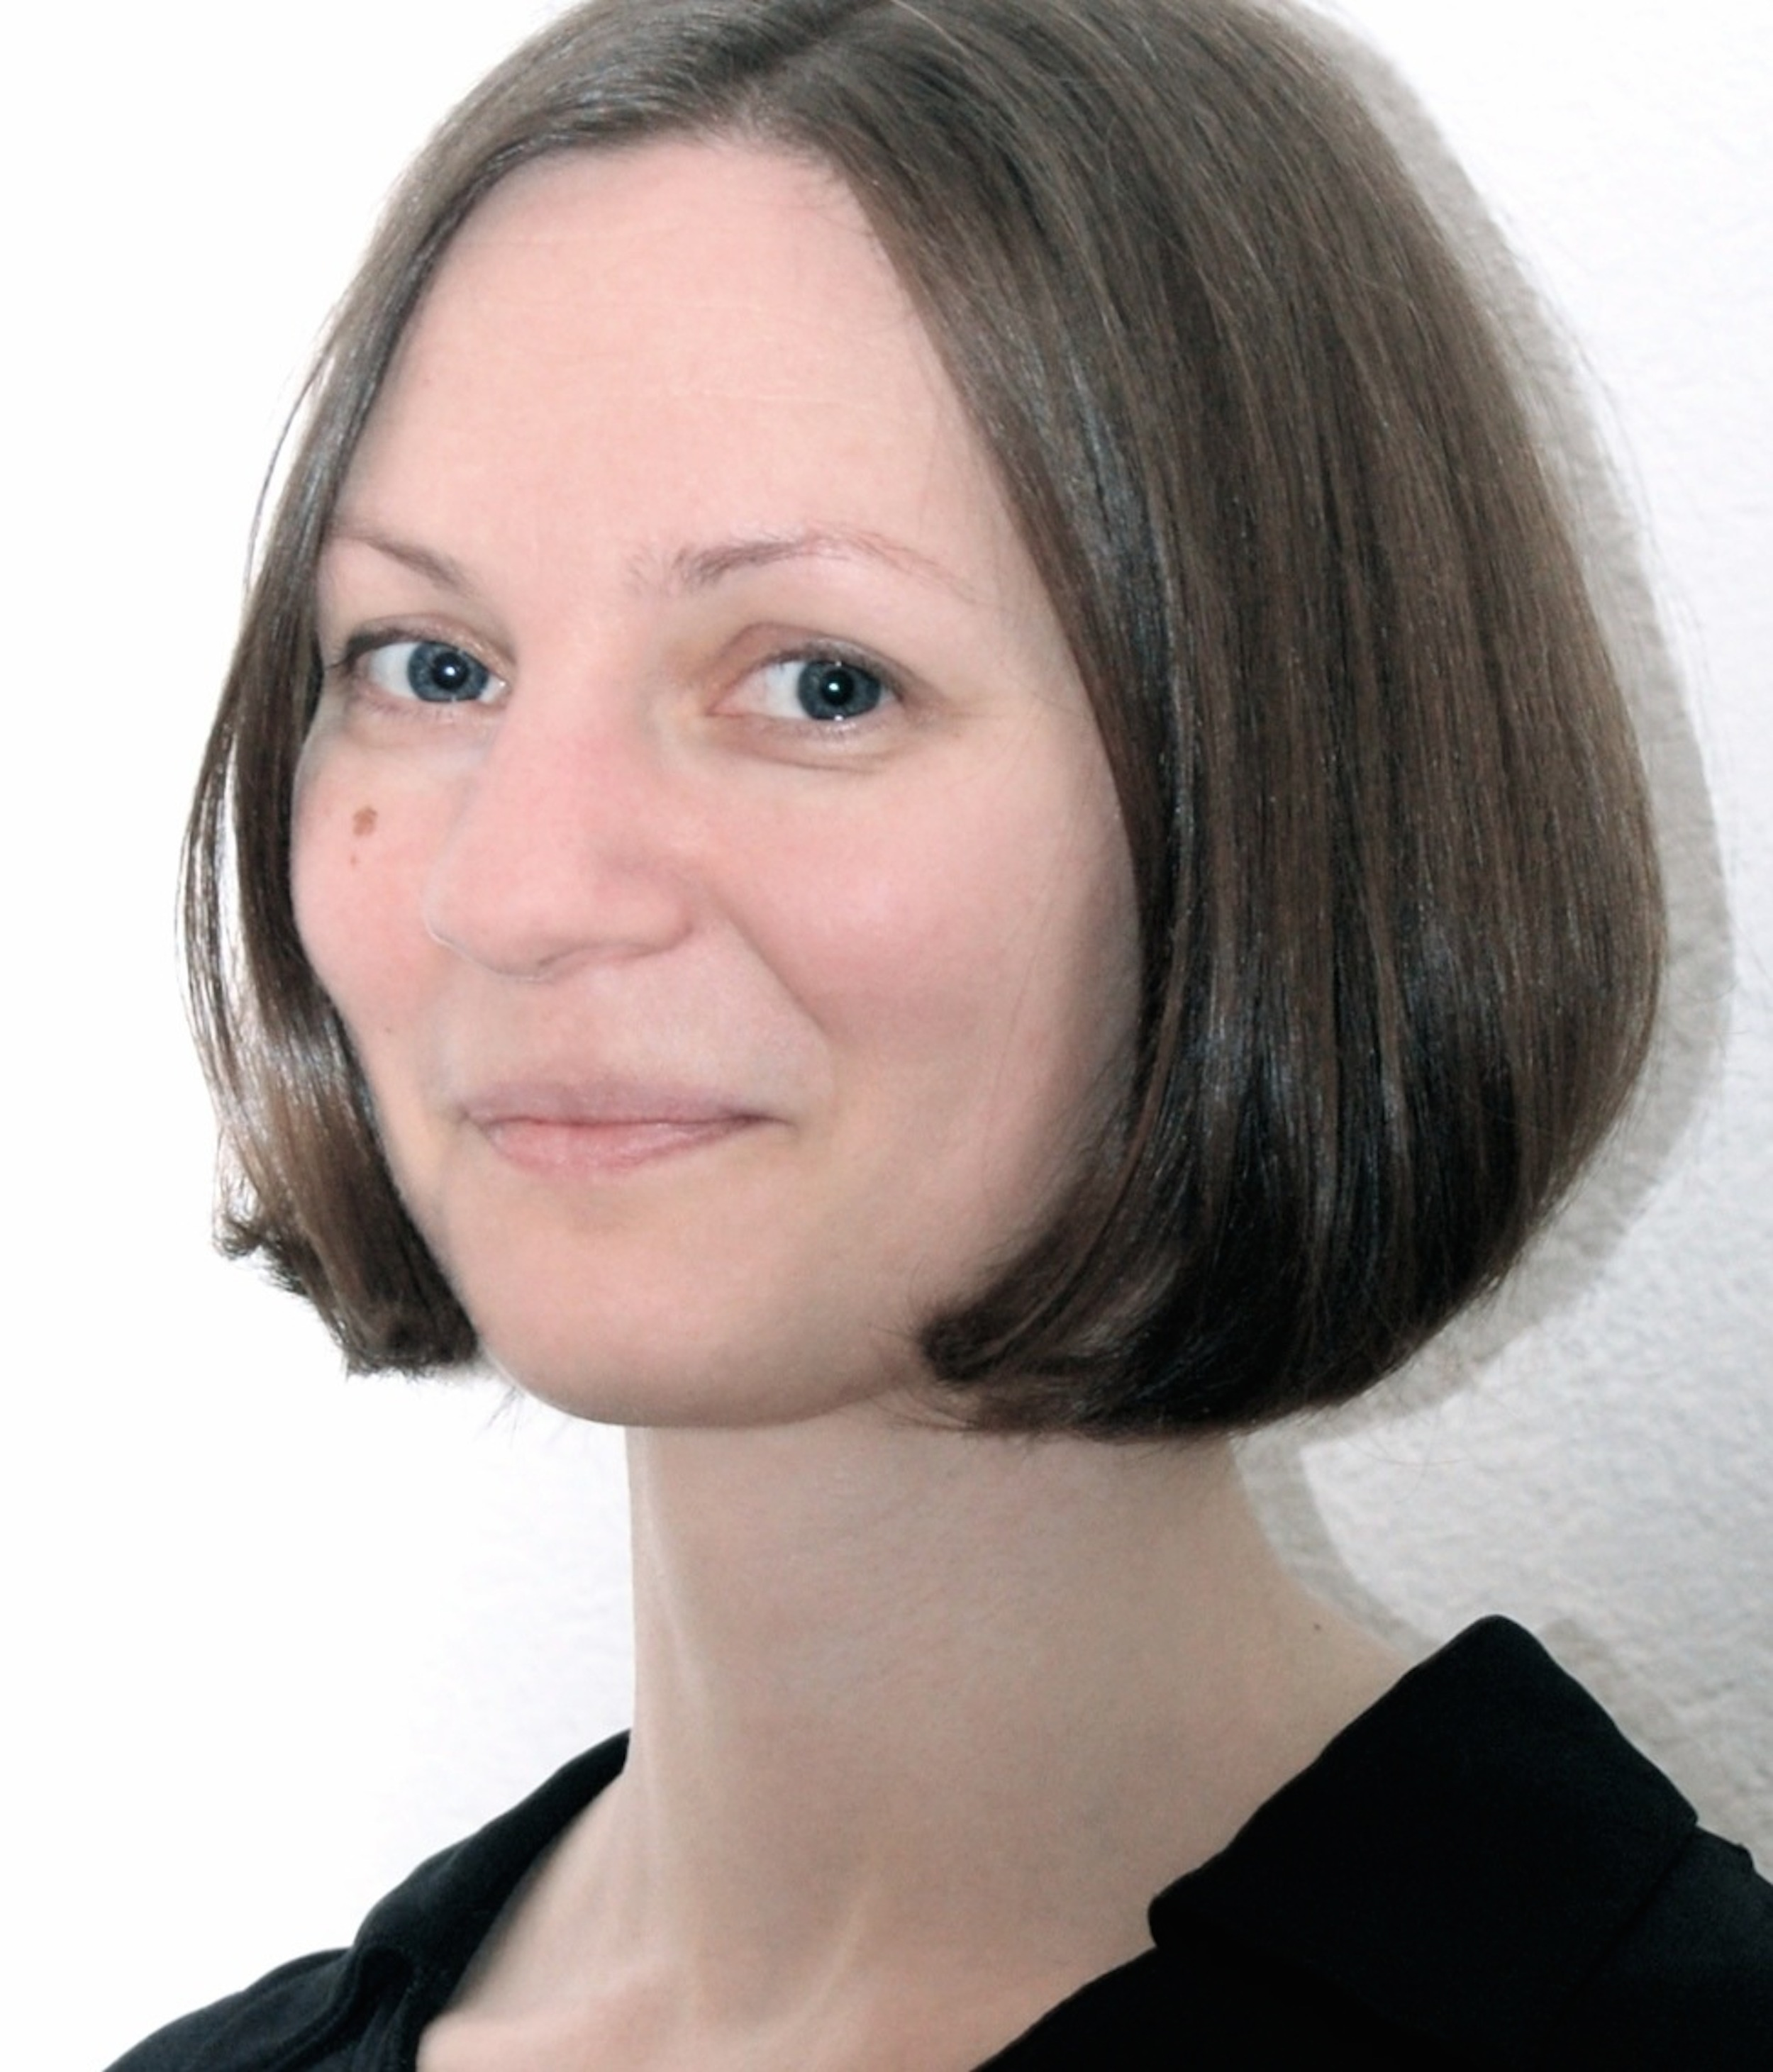 Elisa Rieger